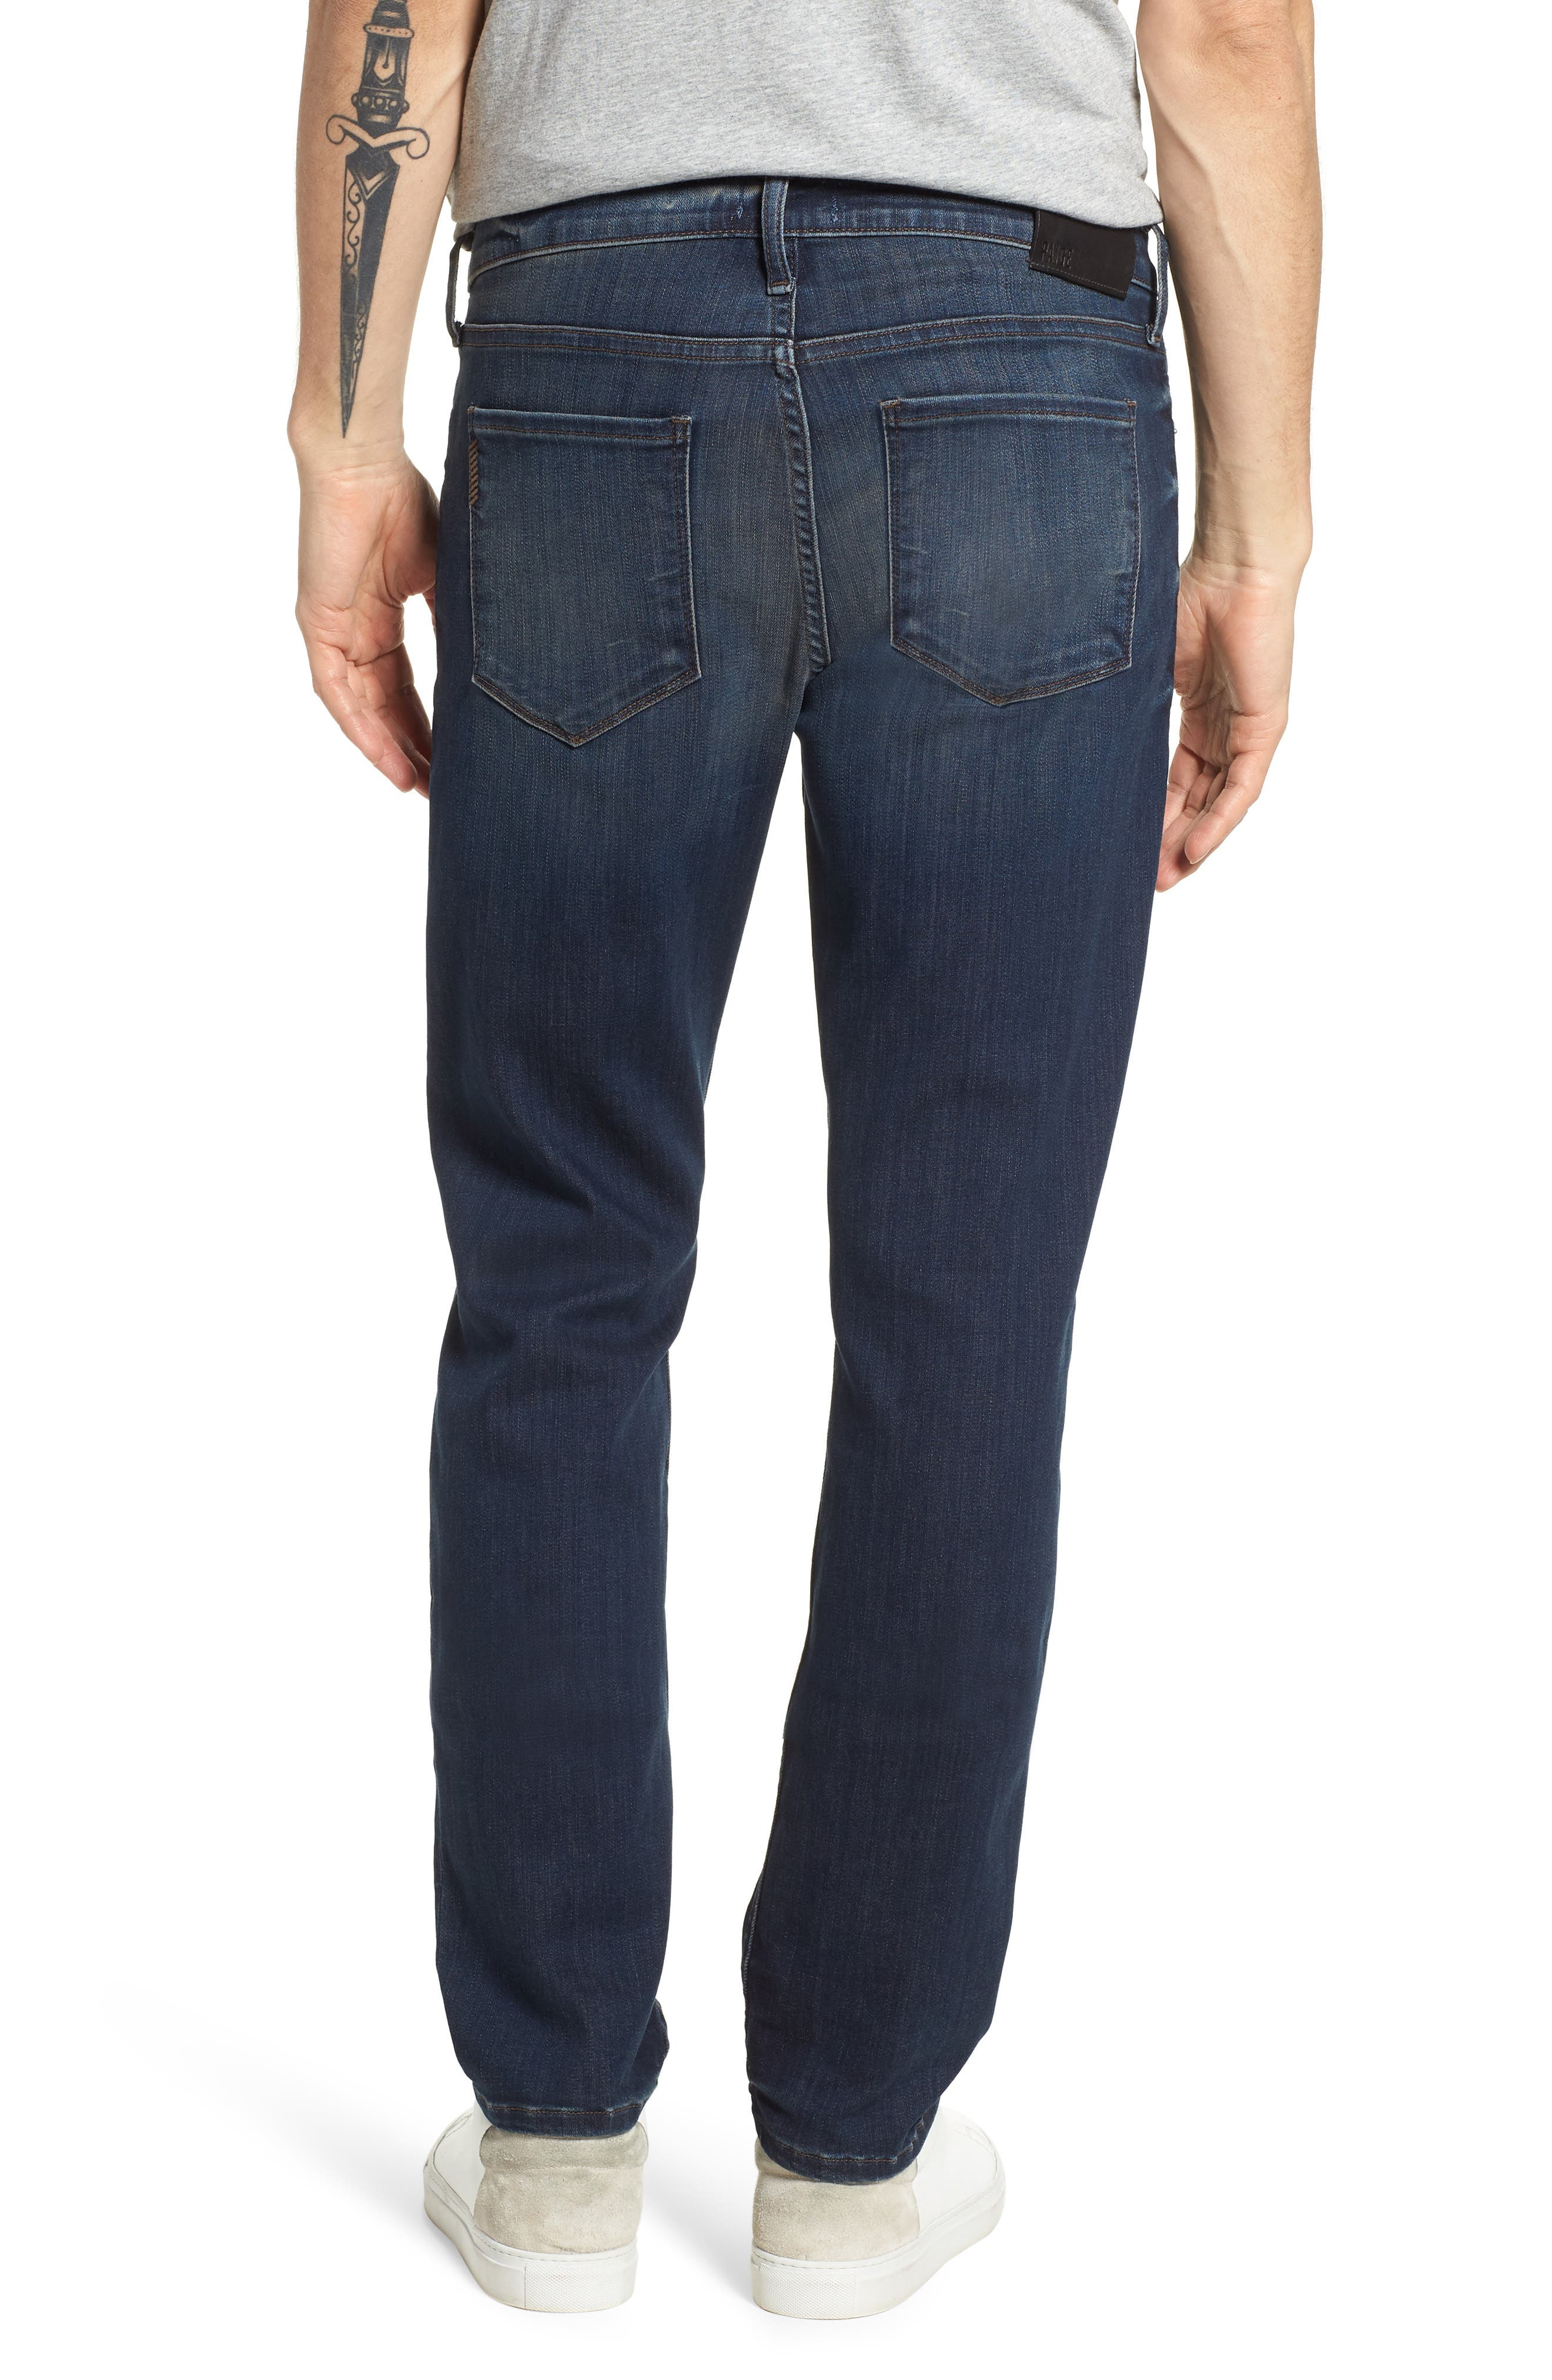 Transcend - Lennox Slim Fit Jeans,                             Alternate thumbnail 2, color,                             Freeman